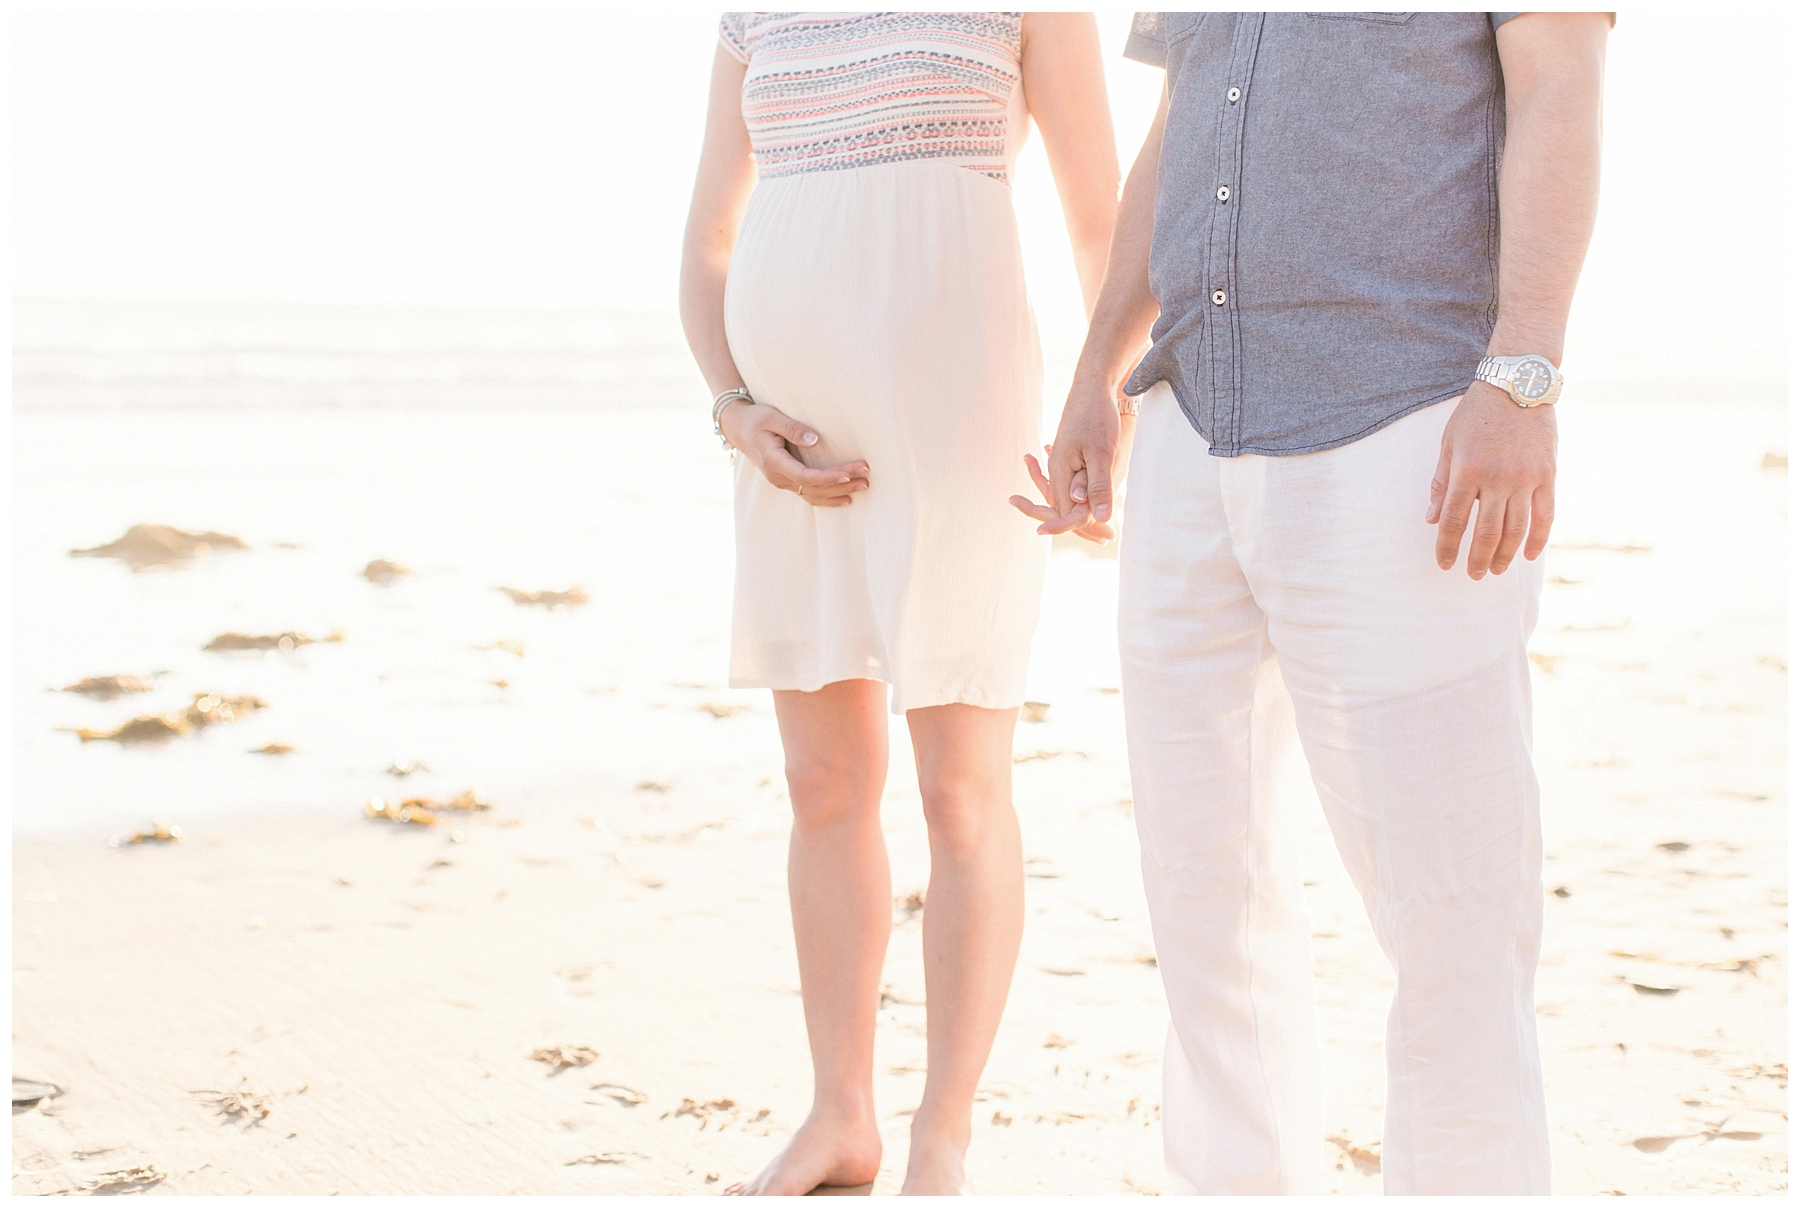 Marie-Alice G-Photographe grossesse maternite nouveau ne valognes cherbourg manche normandie_0023